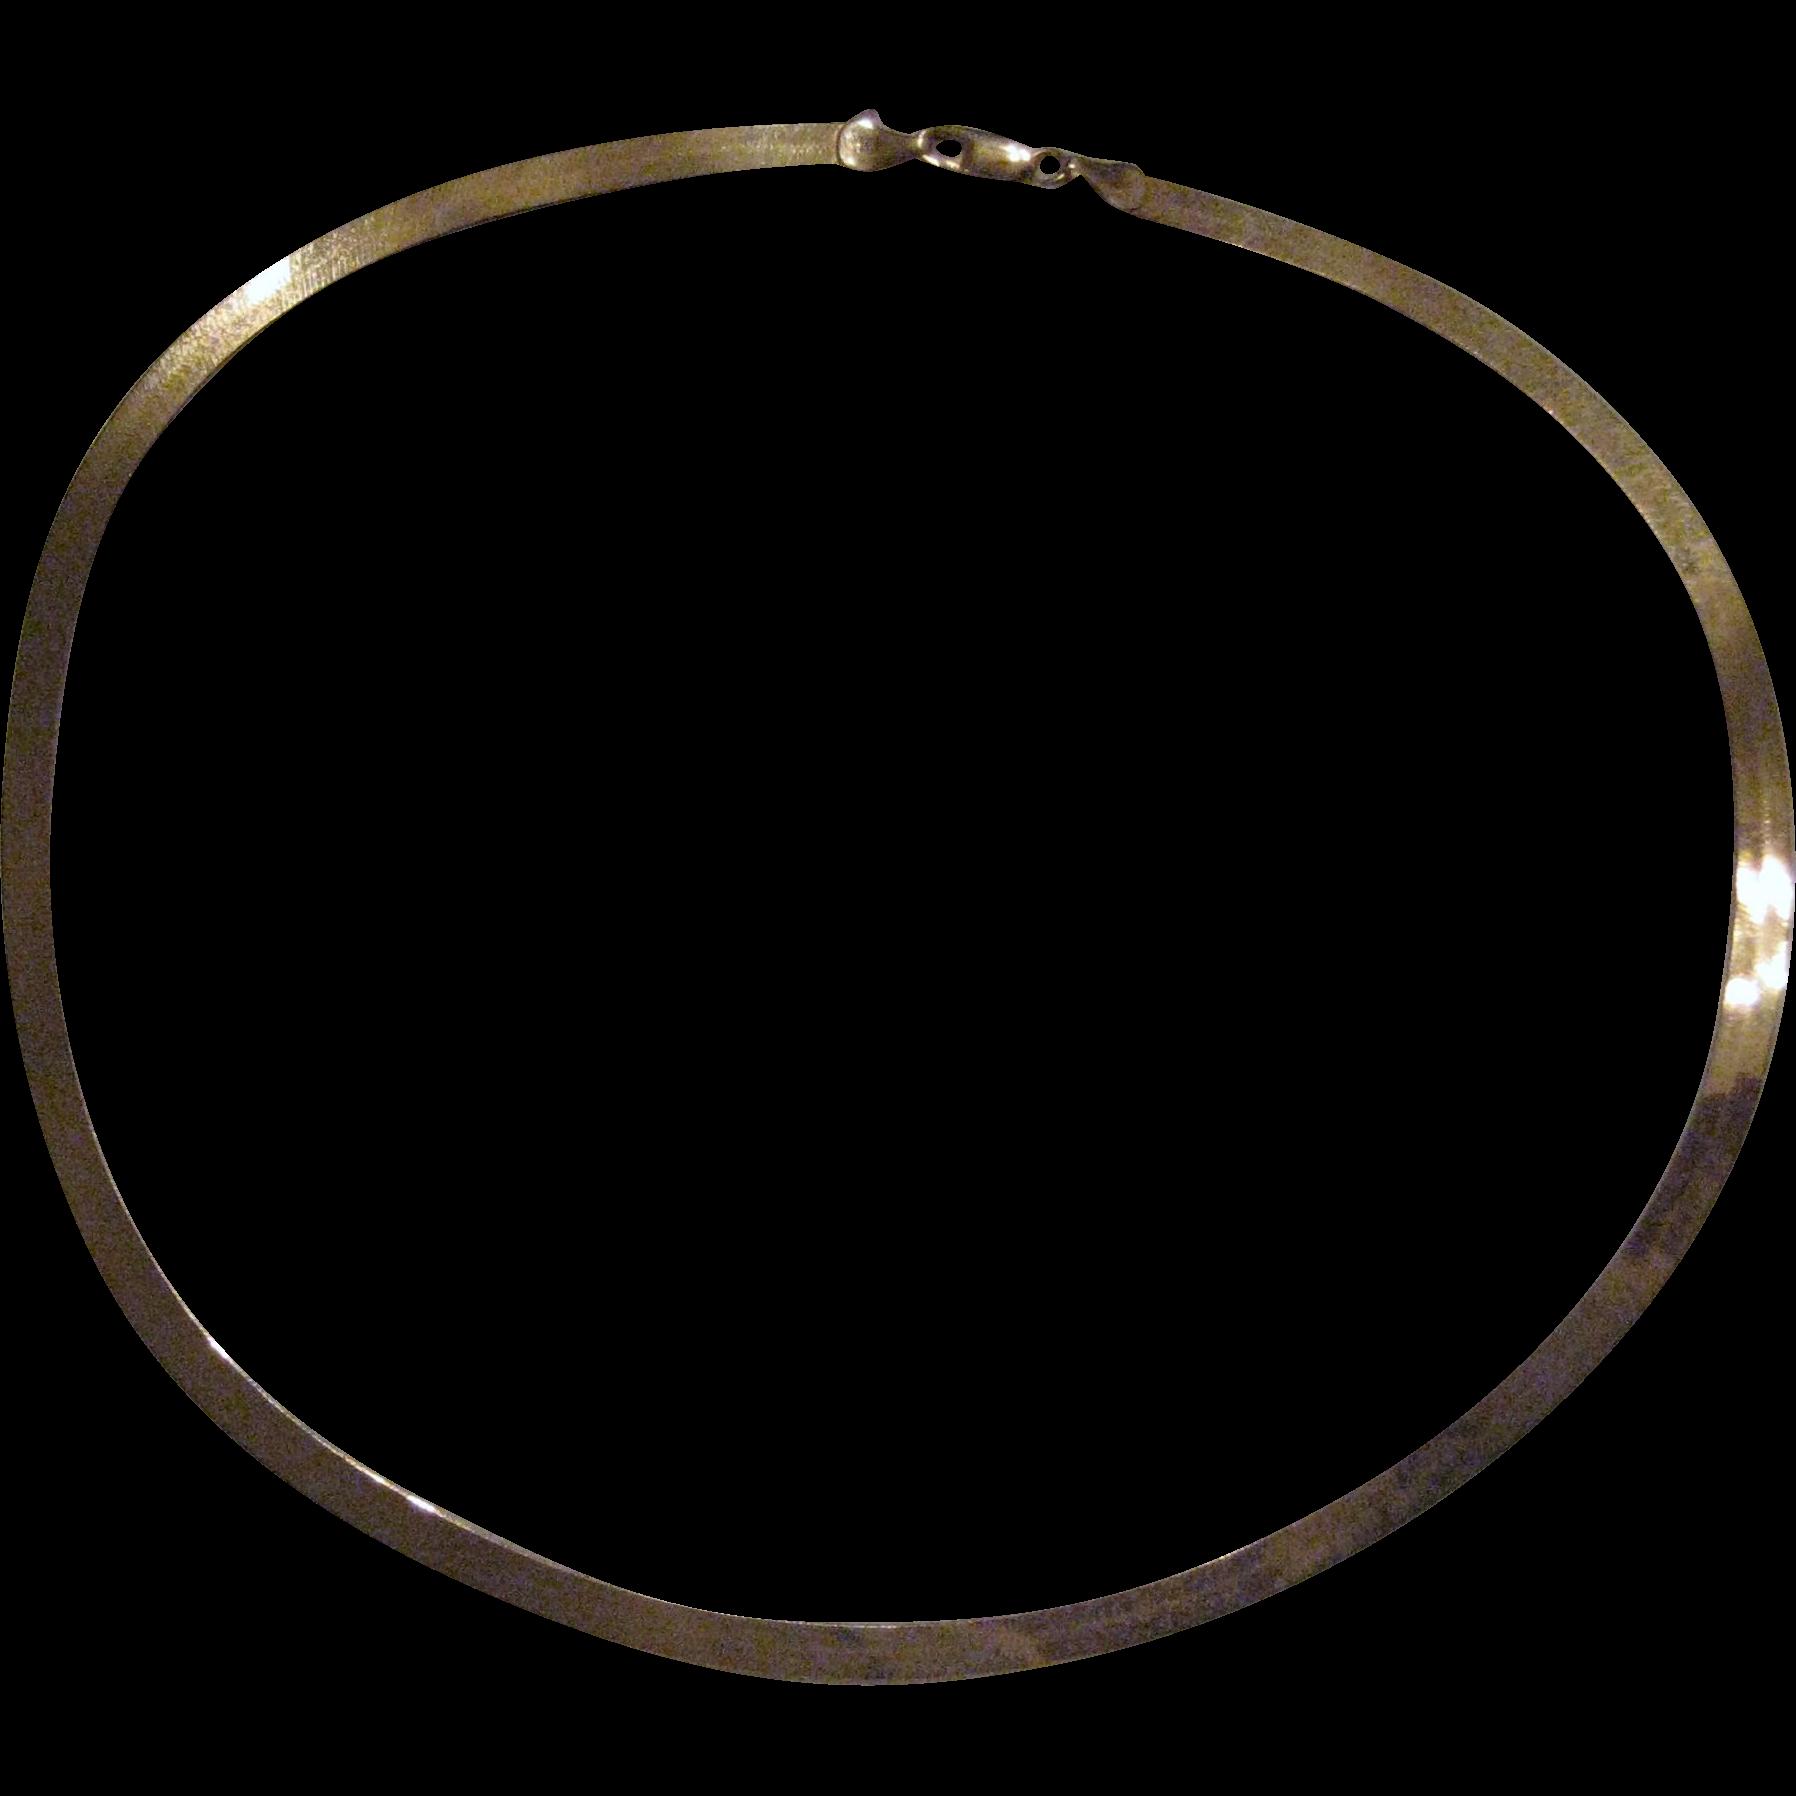 "14K Yellow Gold Aurafin Mirror Flex Herringbone Necklace - 18 1.2"" - 9 Grams"